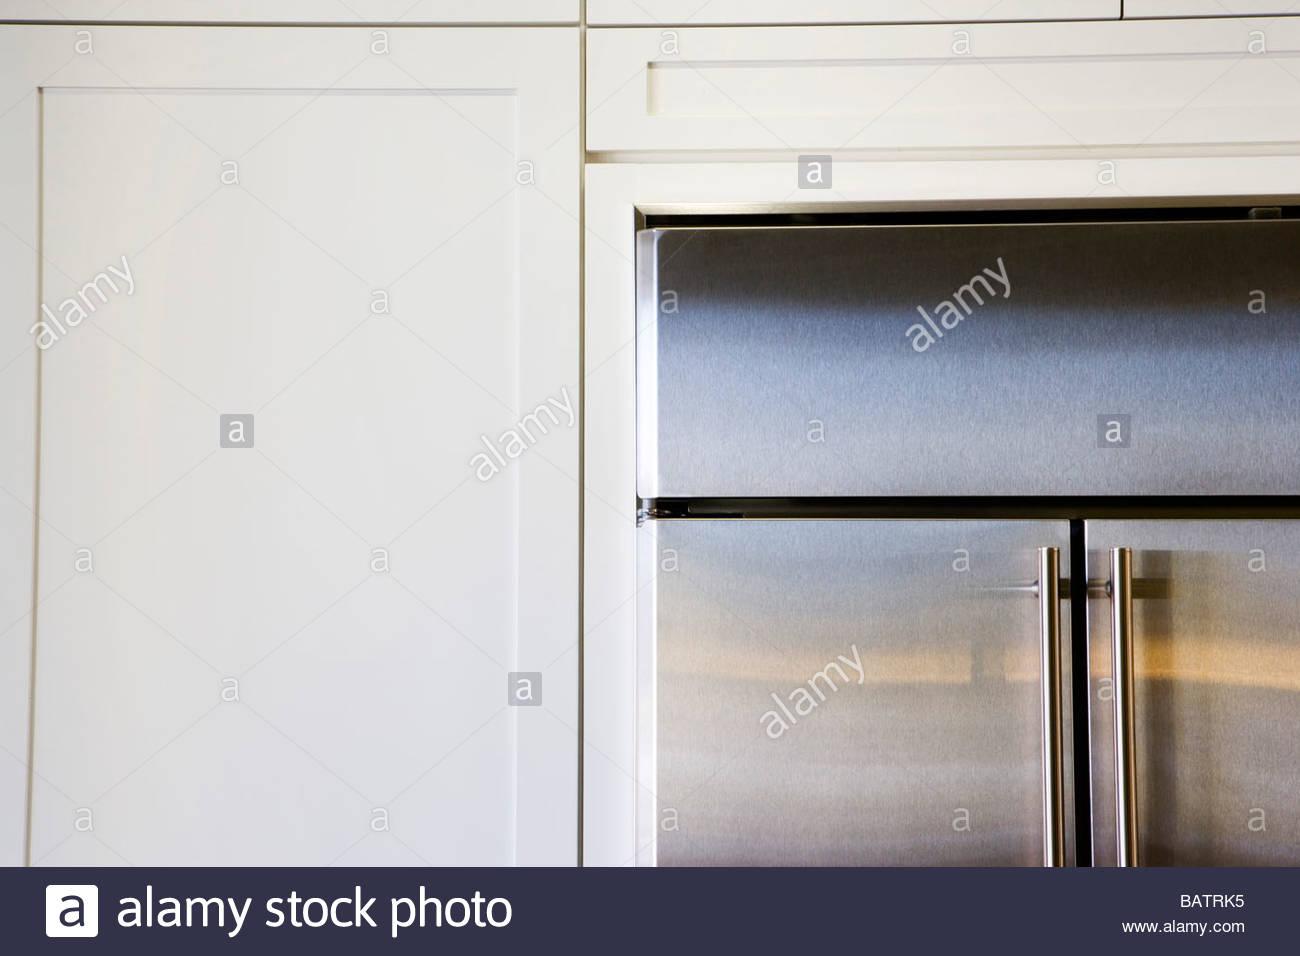 Kühlschrank Edelstahl : Edelstahl kühlschrank und schränke stockfoto bild: 23902345 alamy